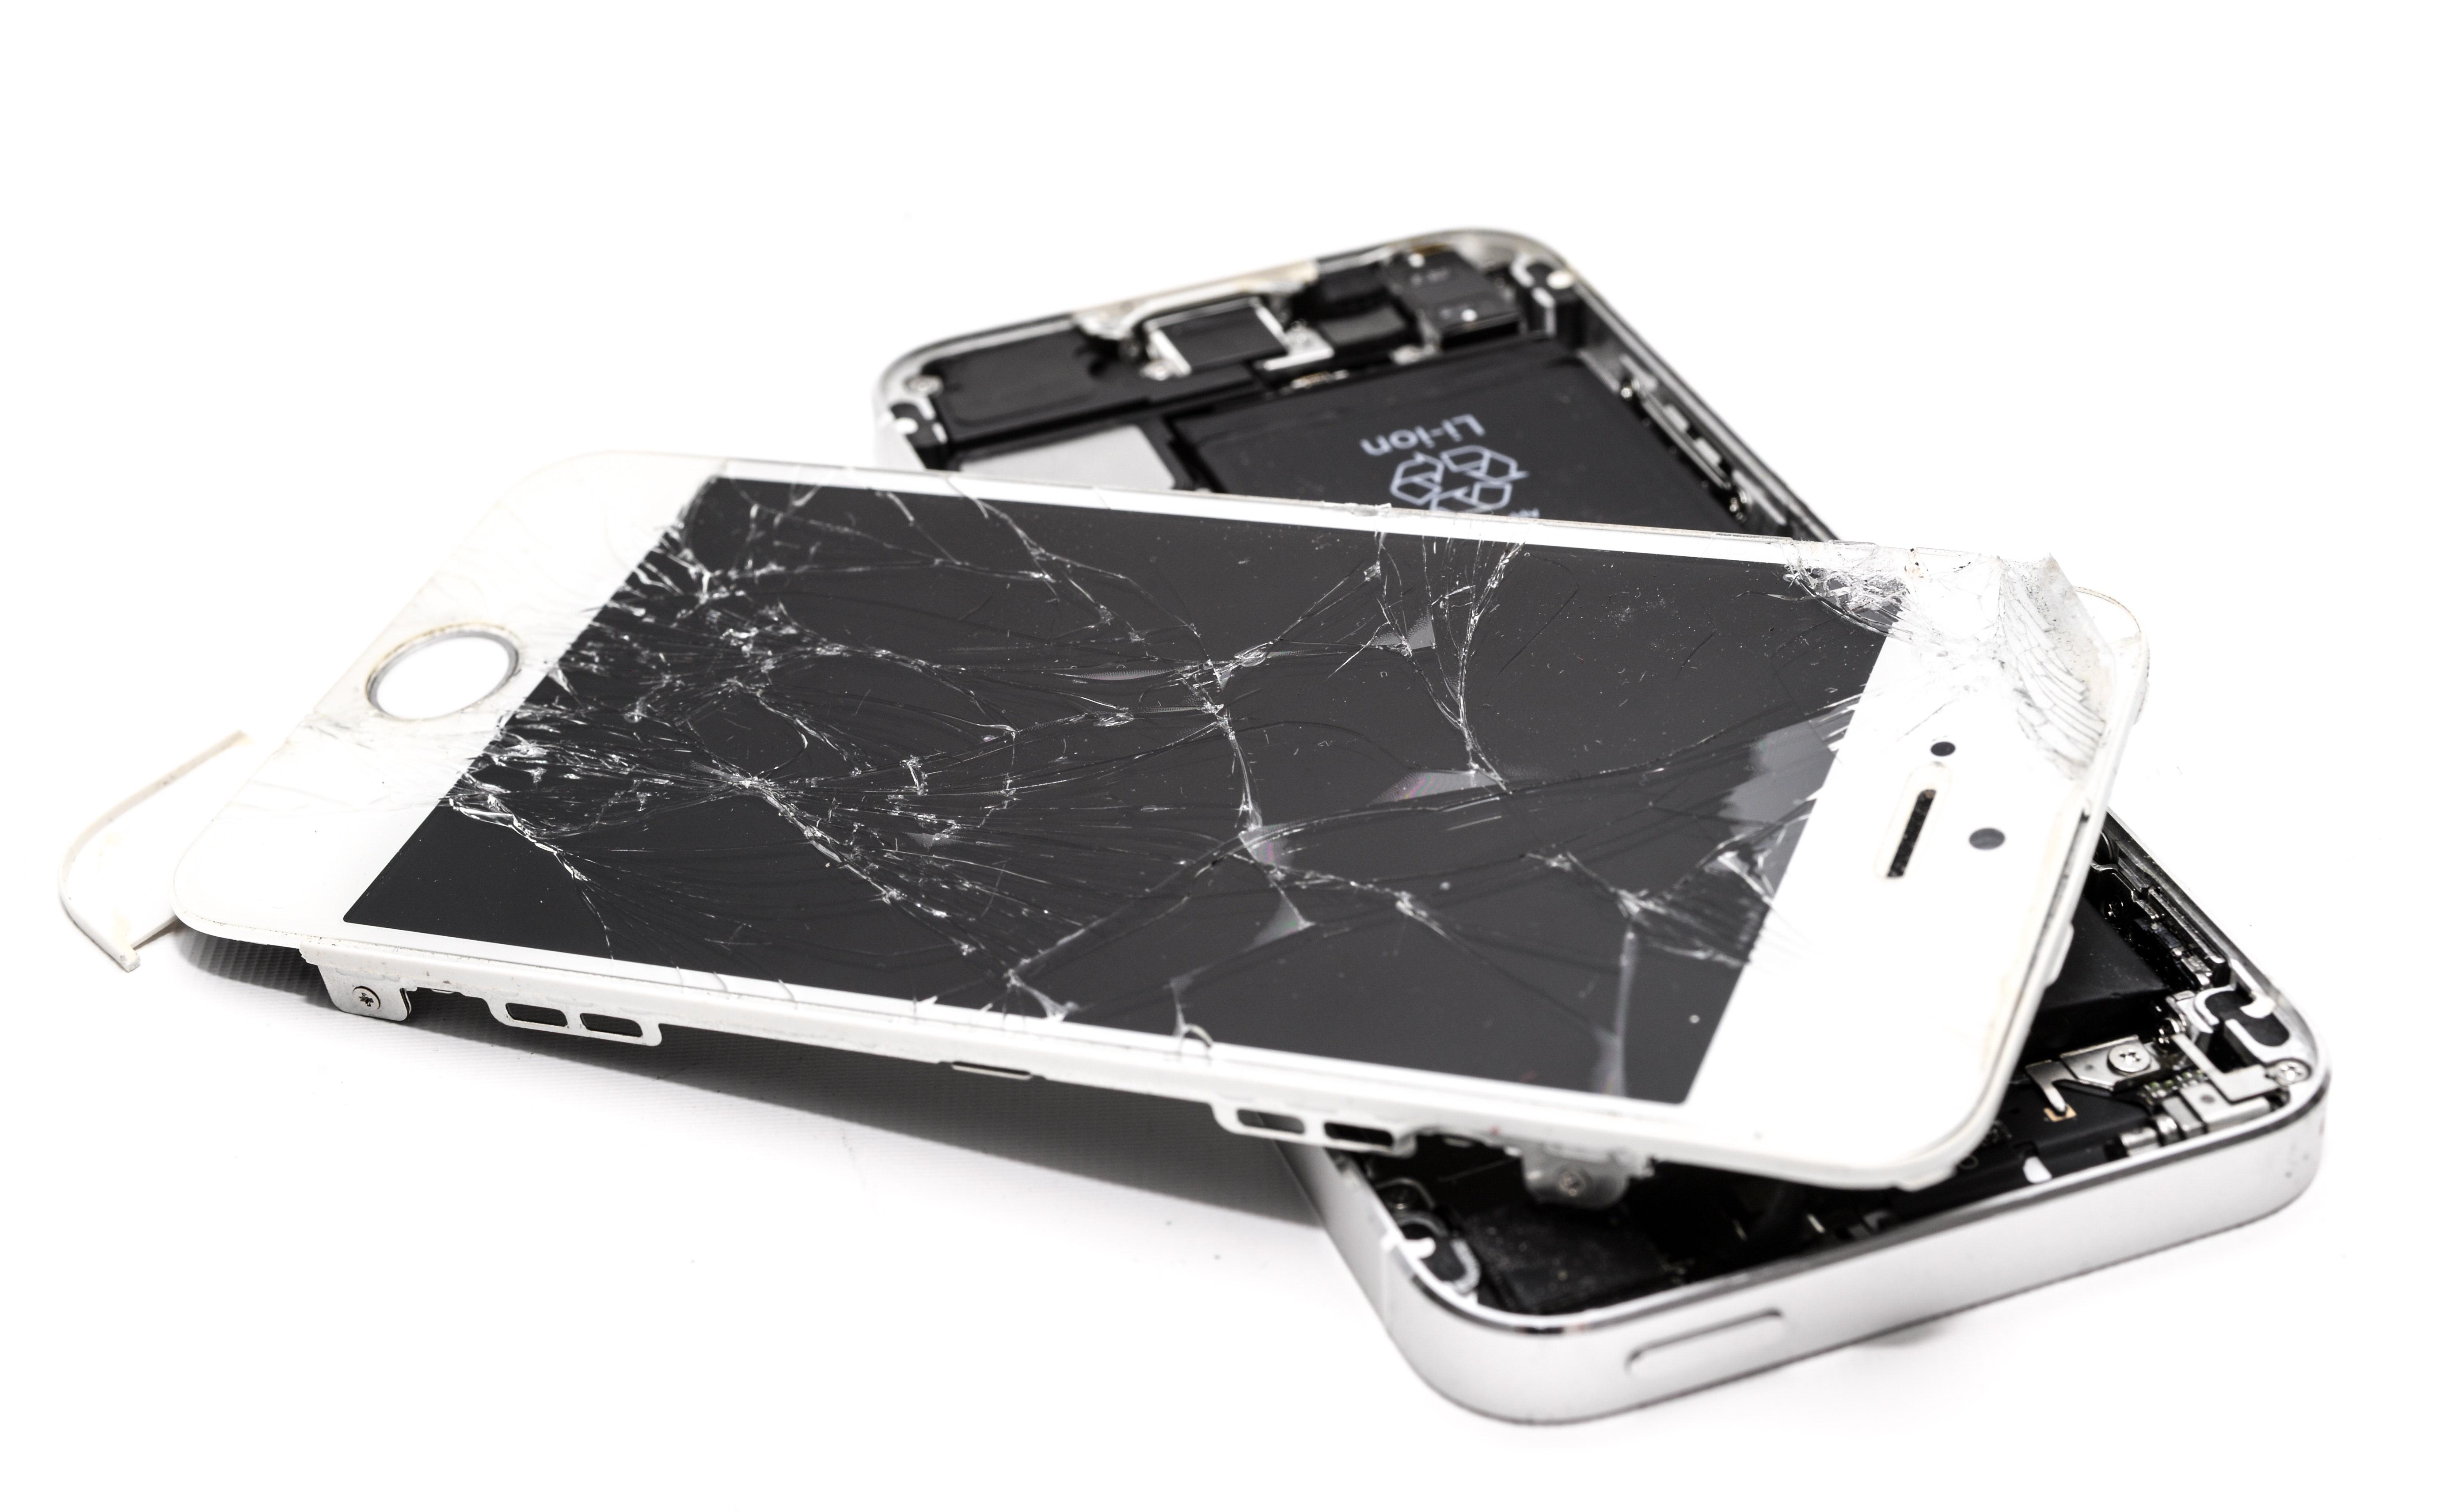 accident-broken-cellphone-1388947